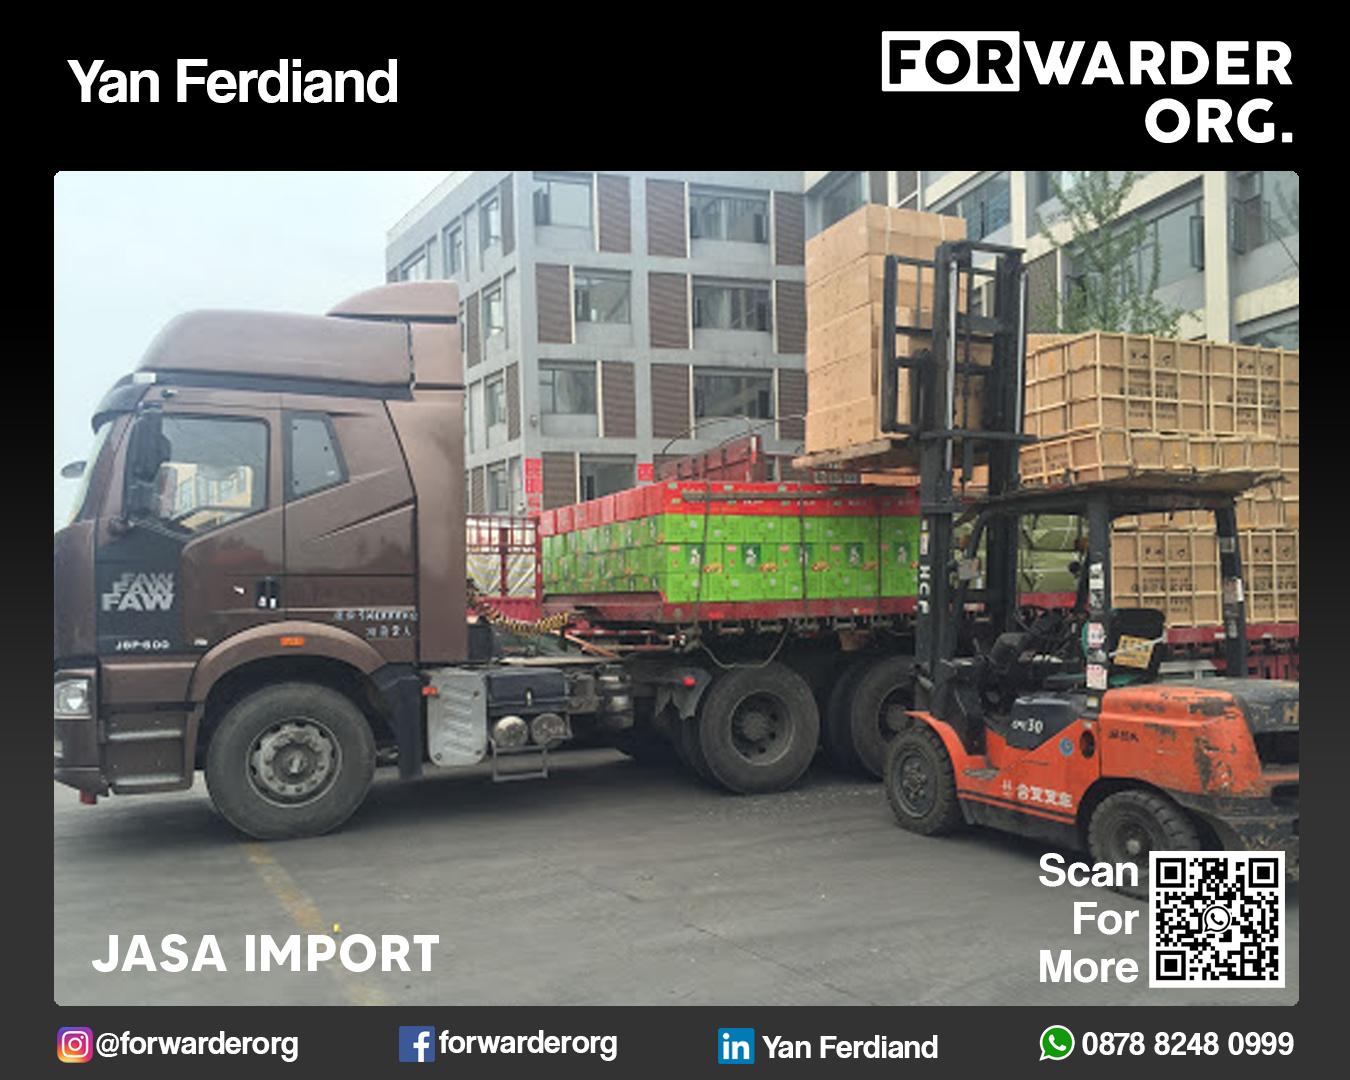 Jasa Import Mesin Pabrik dari Asia dan Eropa | FORWARDER ORG